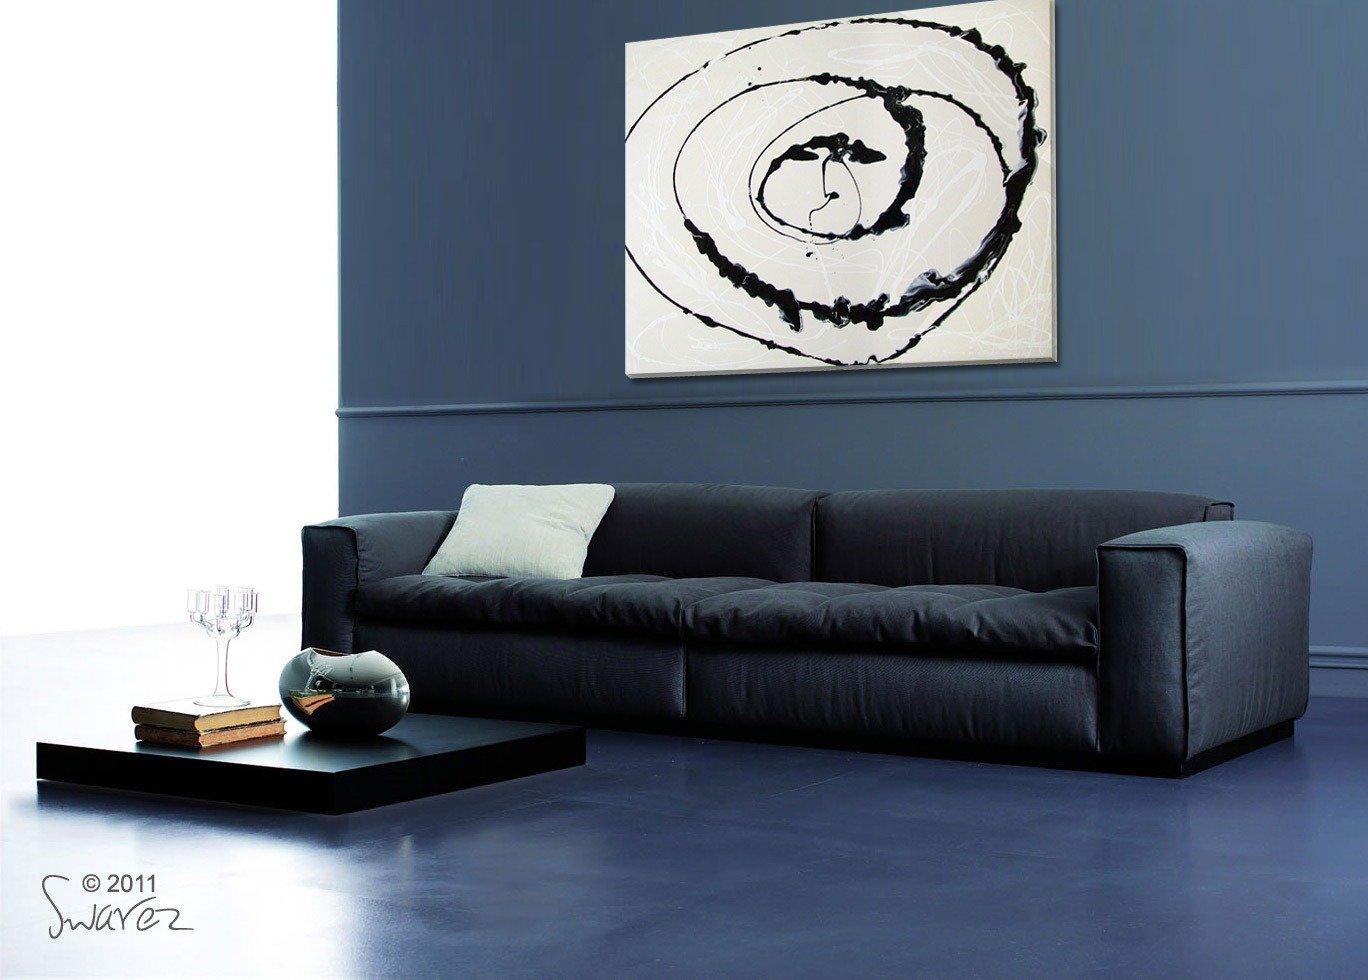 Swarez modern art